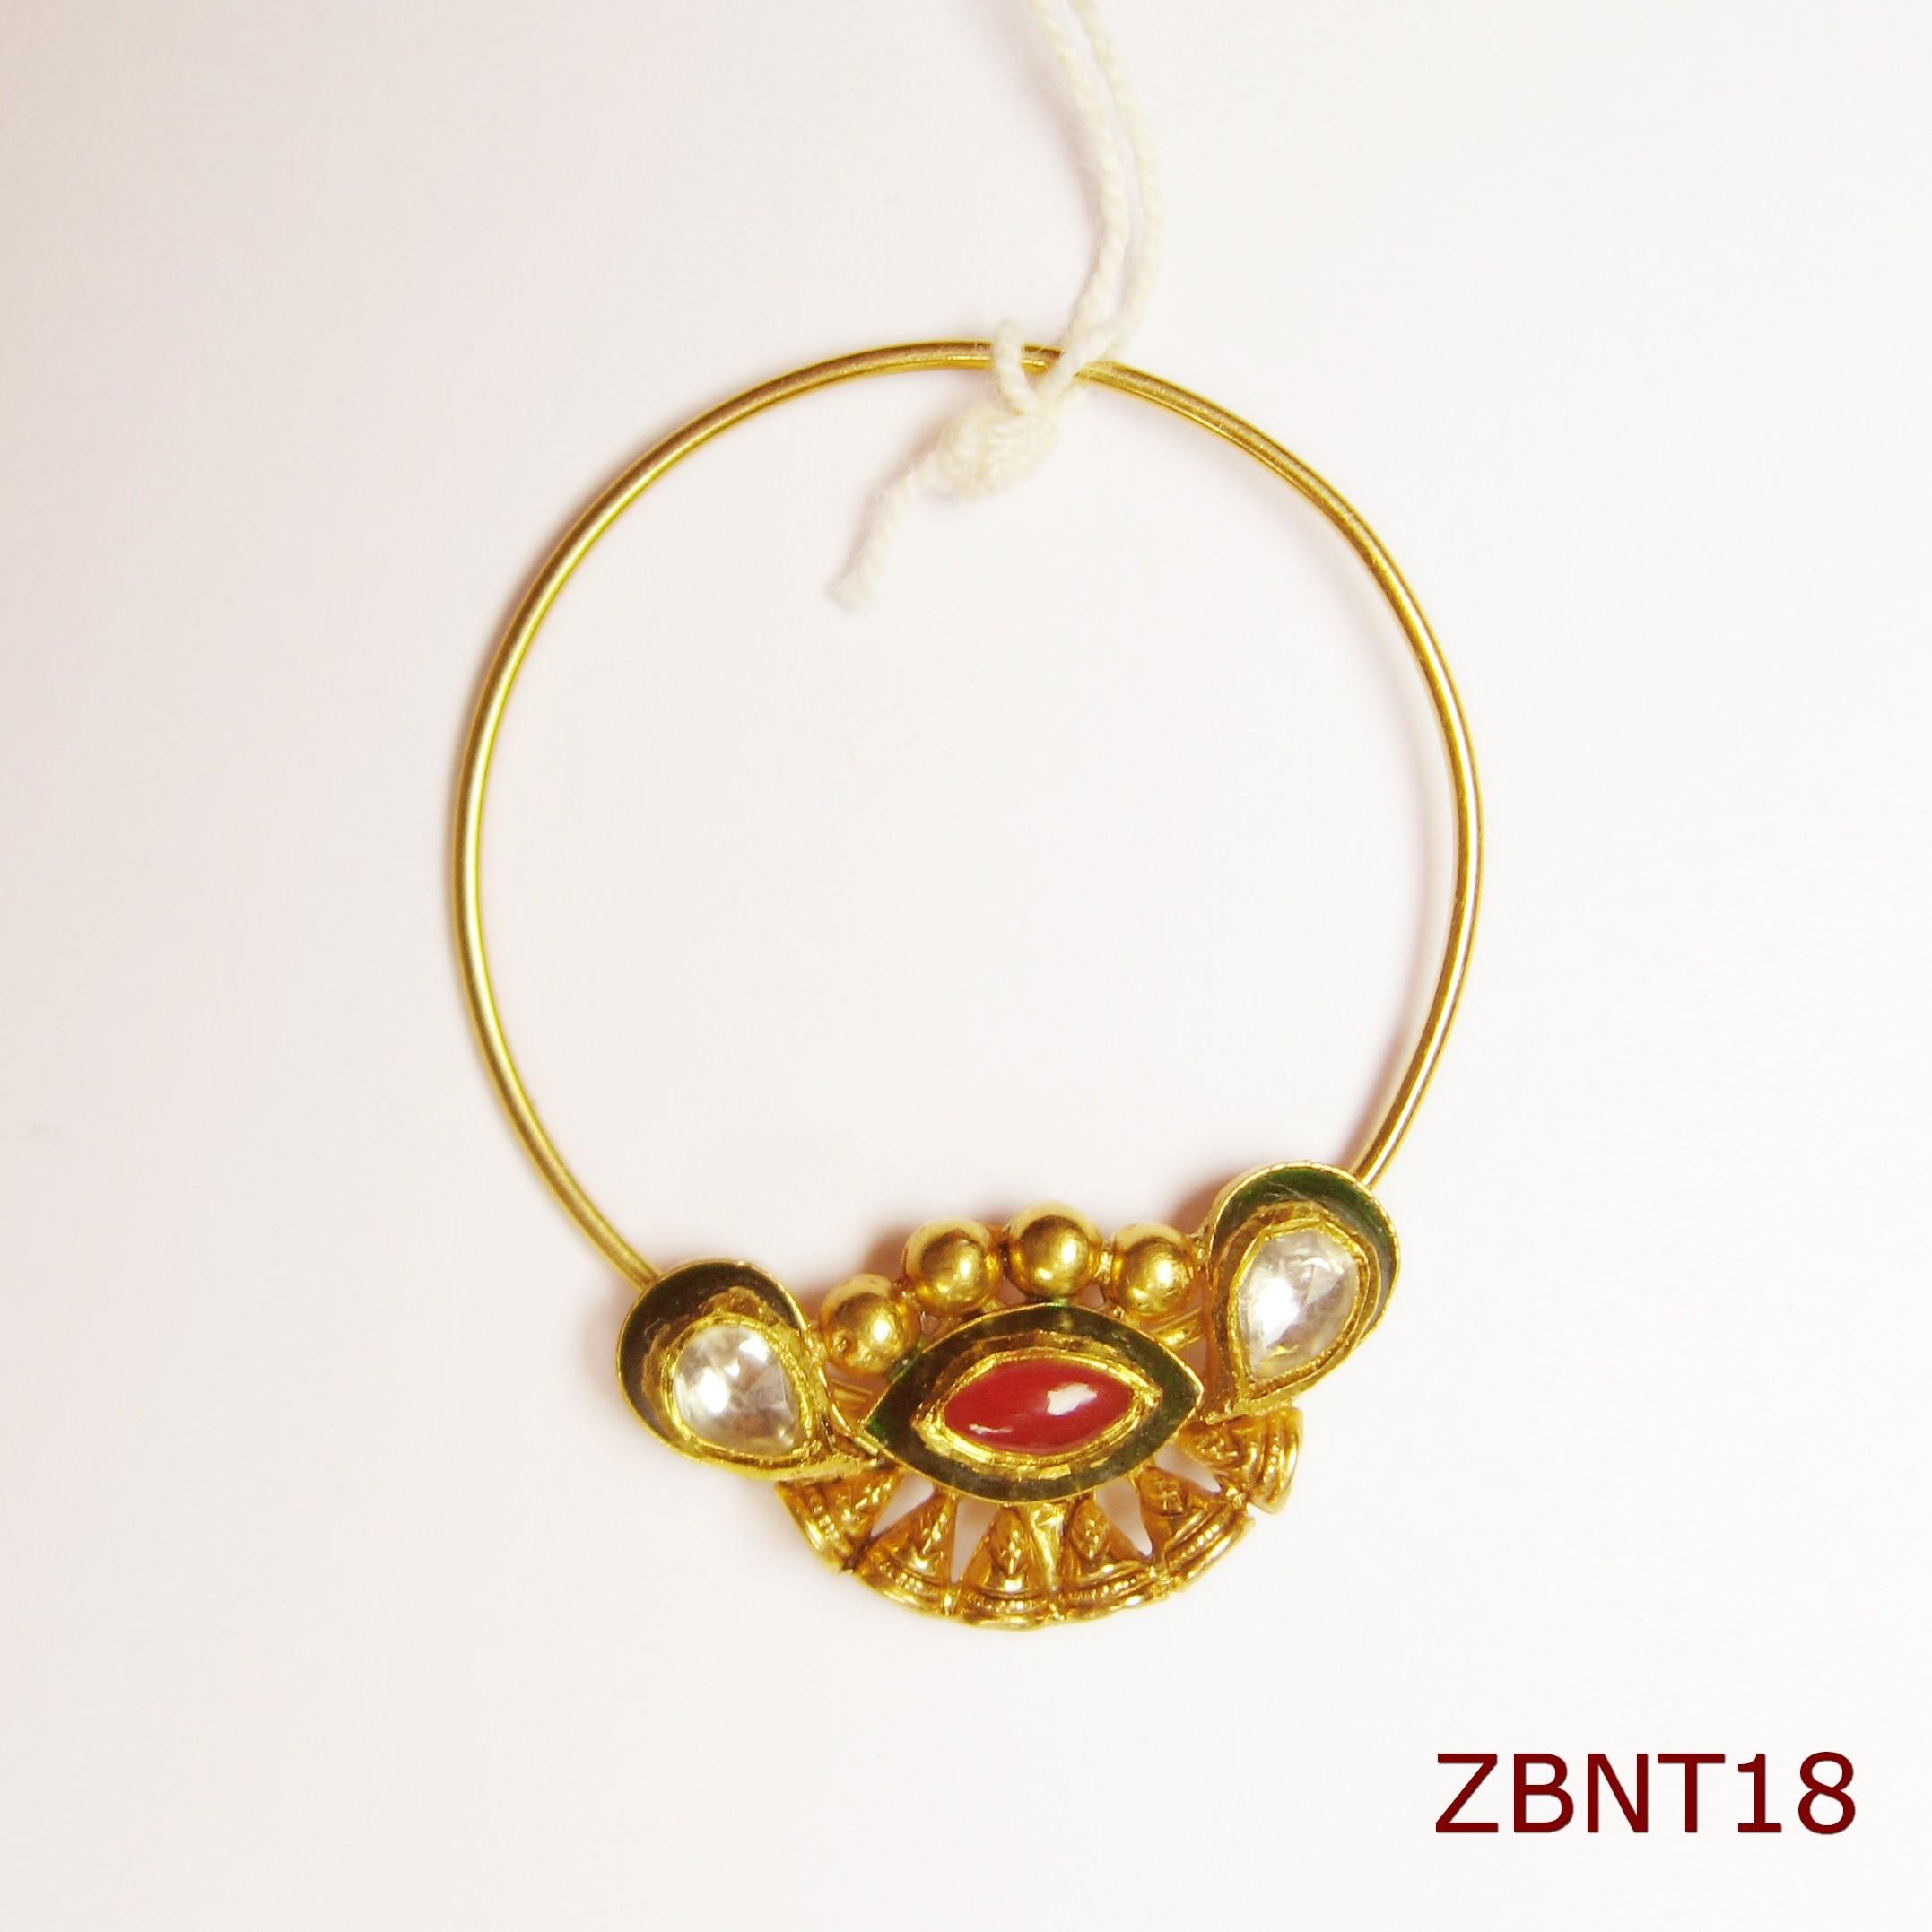 ZBNT18